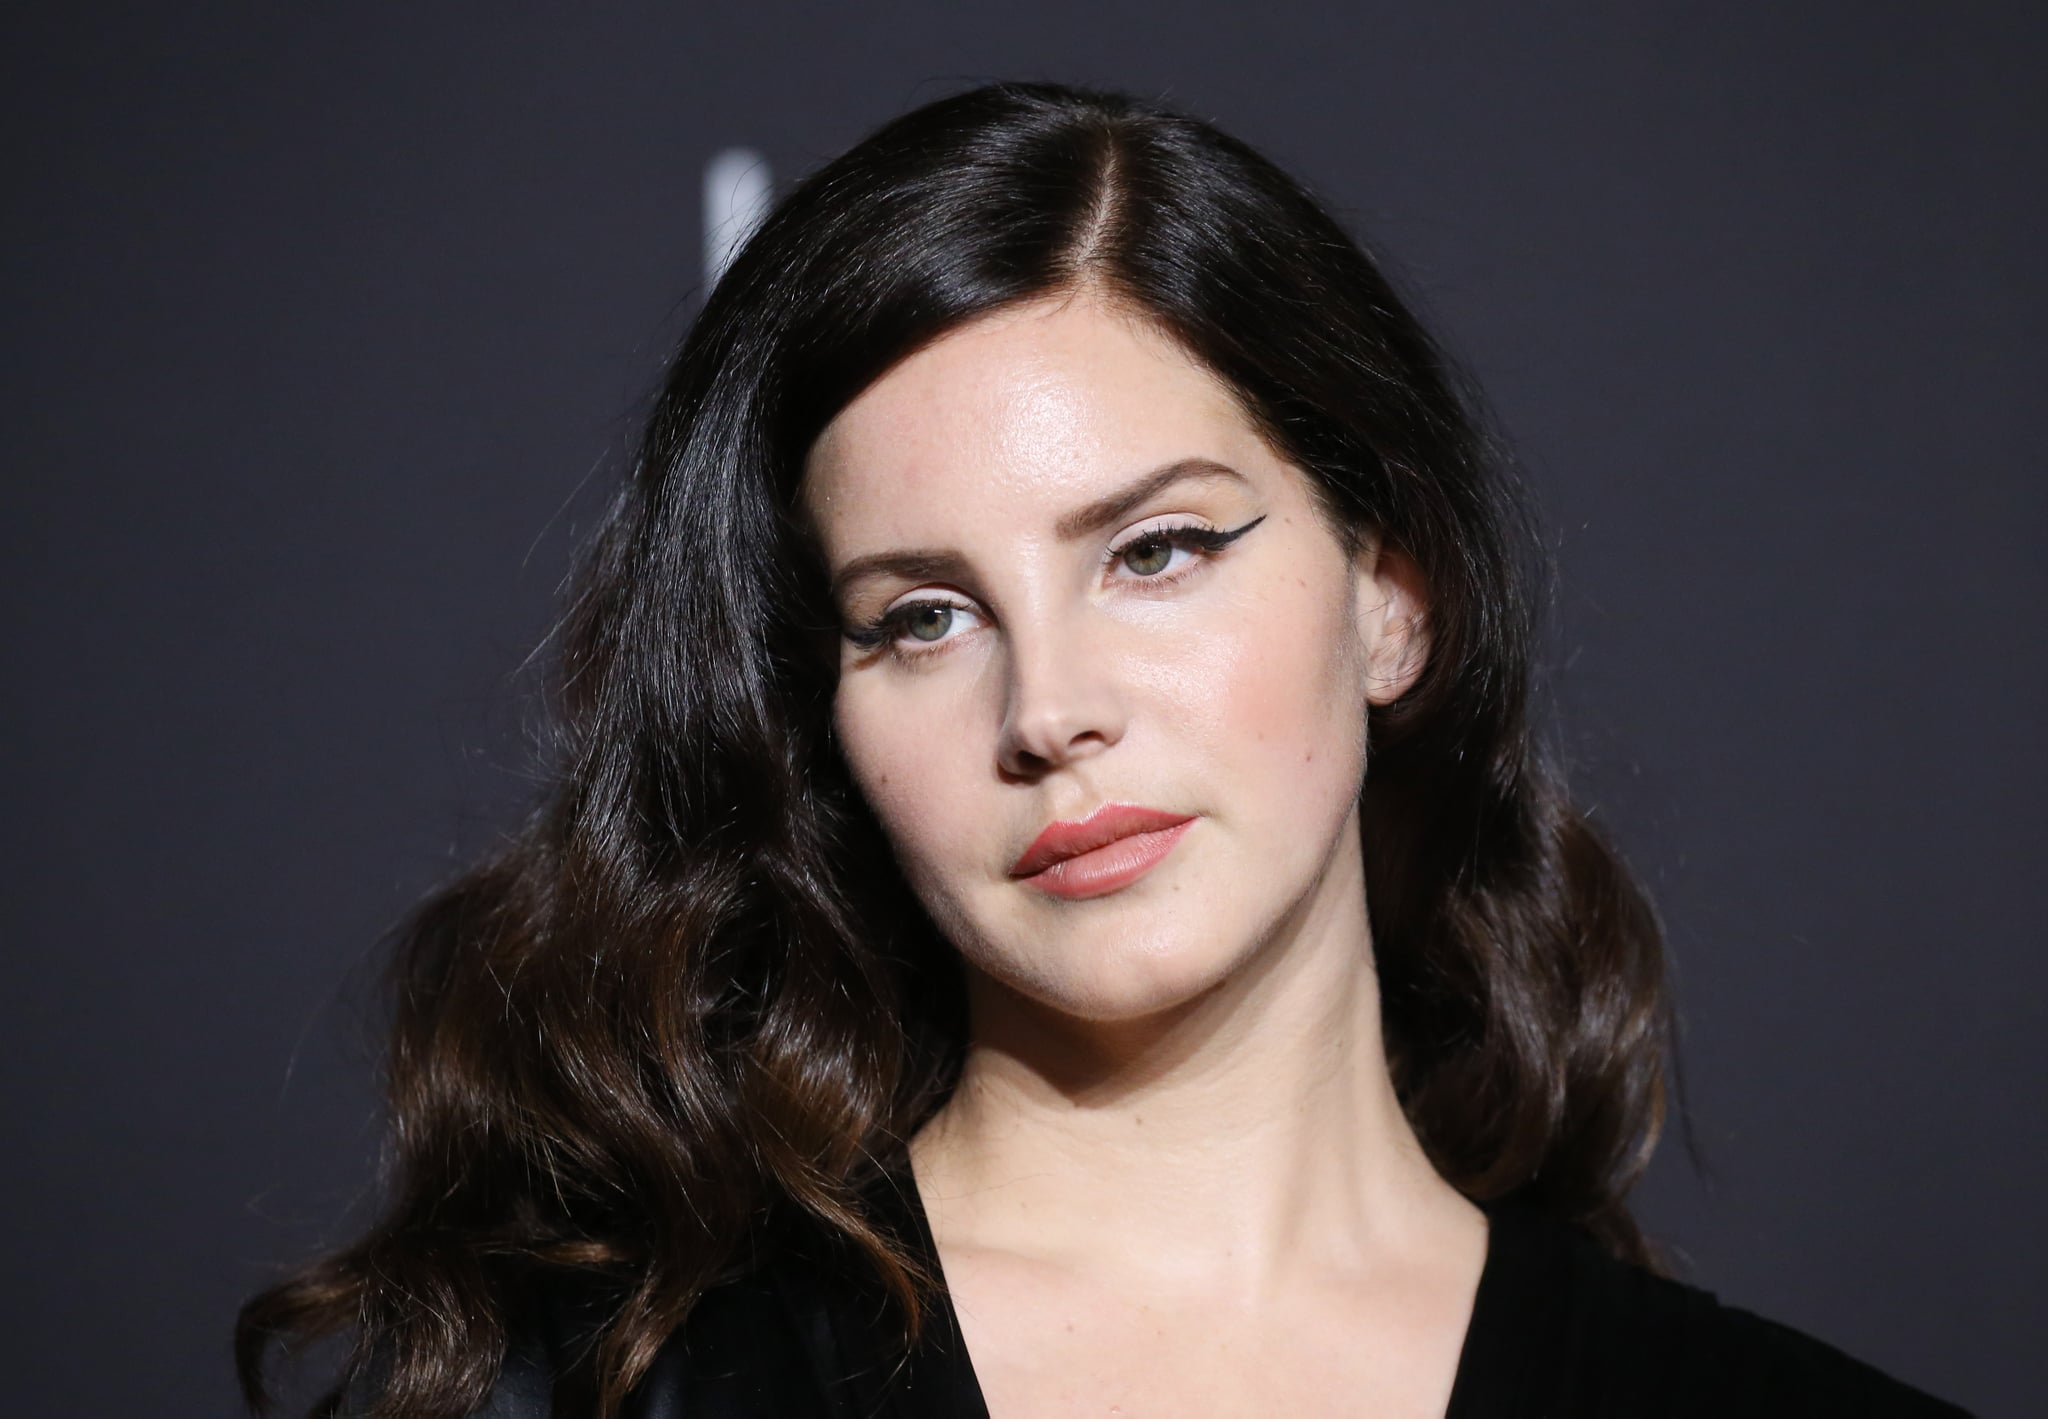 LOS ANGELES, CALIFORNIA - NOVEMBER 03: Lana Del Rey attends the 2018 LACMA Art + Film Gala held at LACMA on November 03, 2018 in Los Angeles, California. (Photo by Michael Tran/FilmMagic)